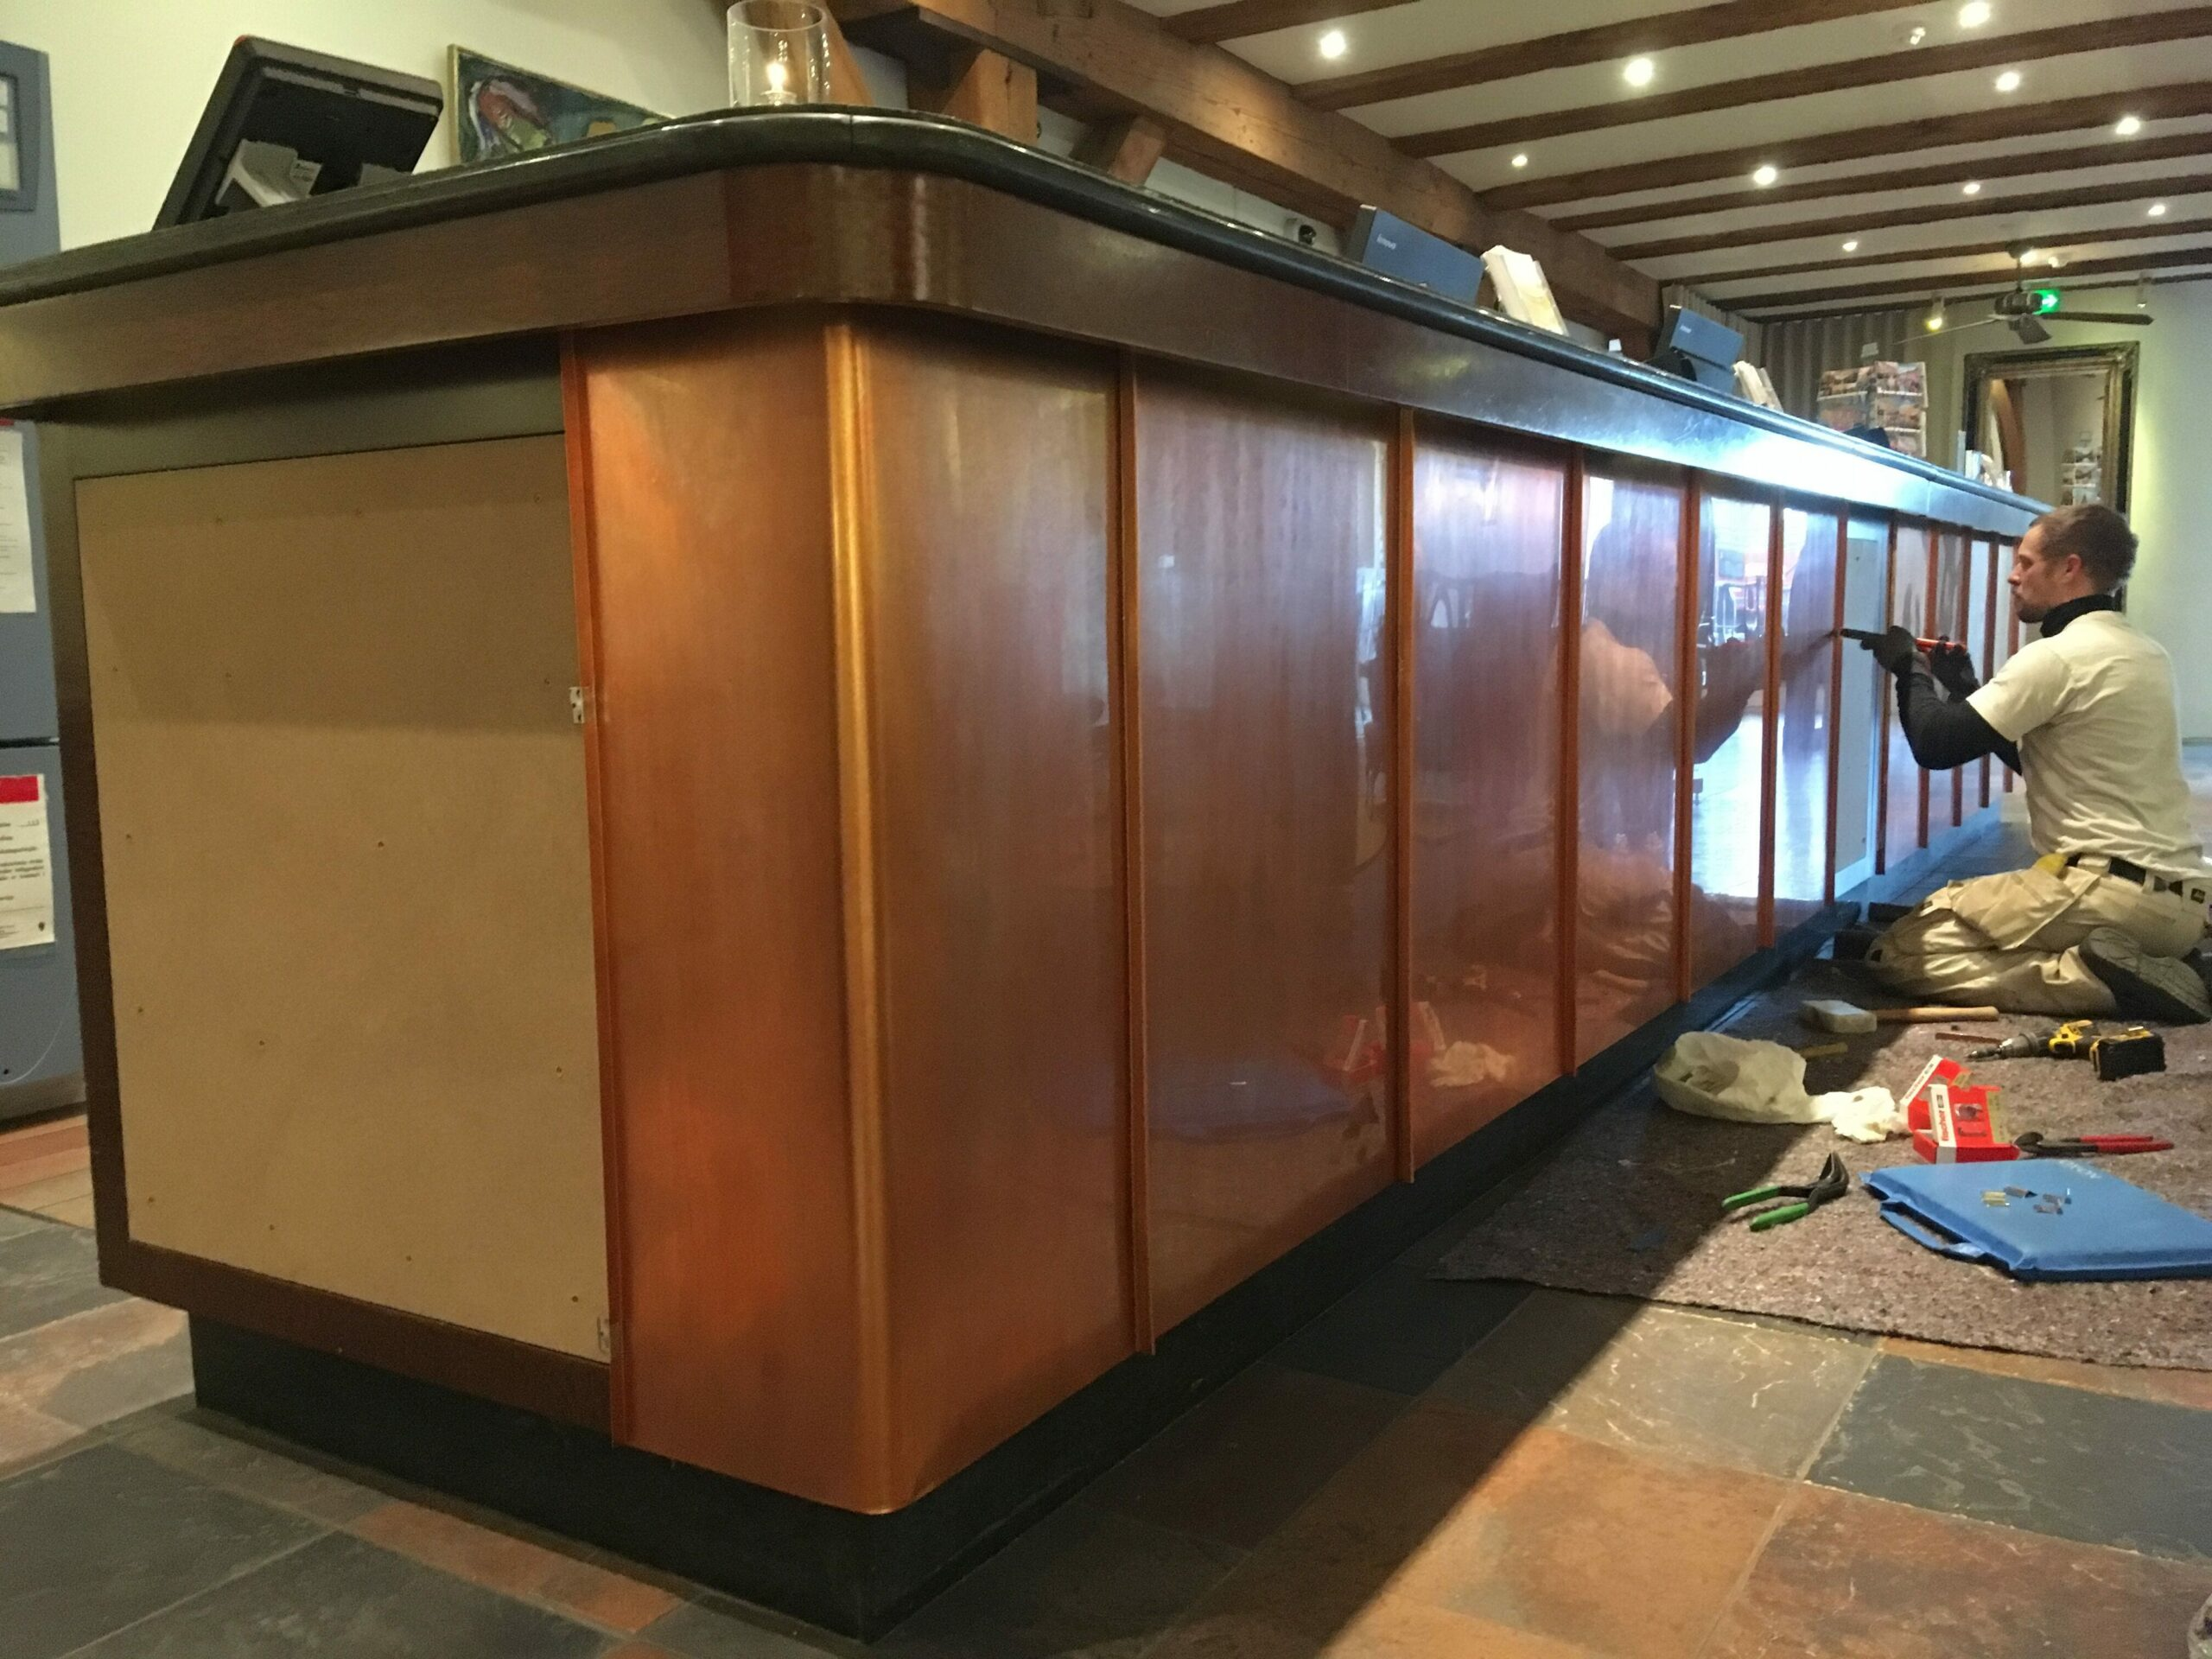 Setting up the copper reception desk